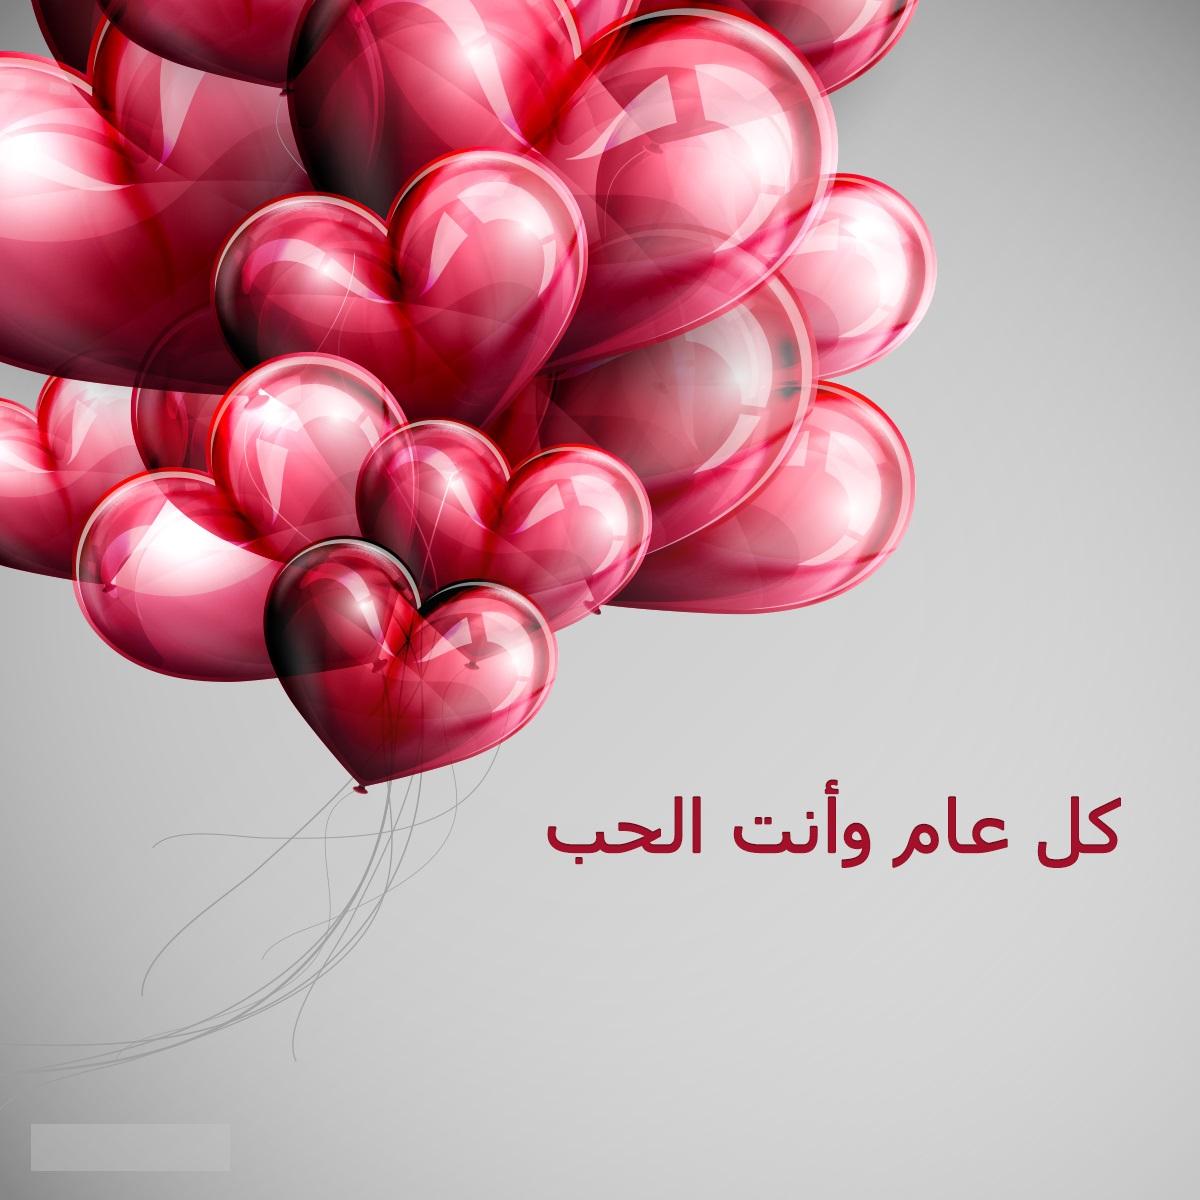 صورة صور اعياد ميلاد حب , رسائل اعياد ميلاد حديثه